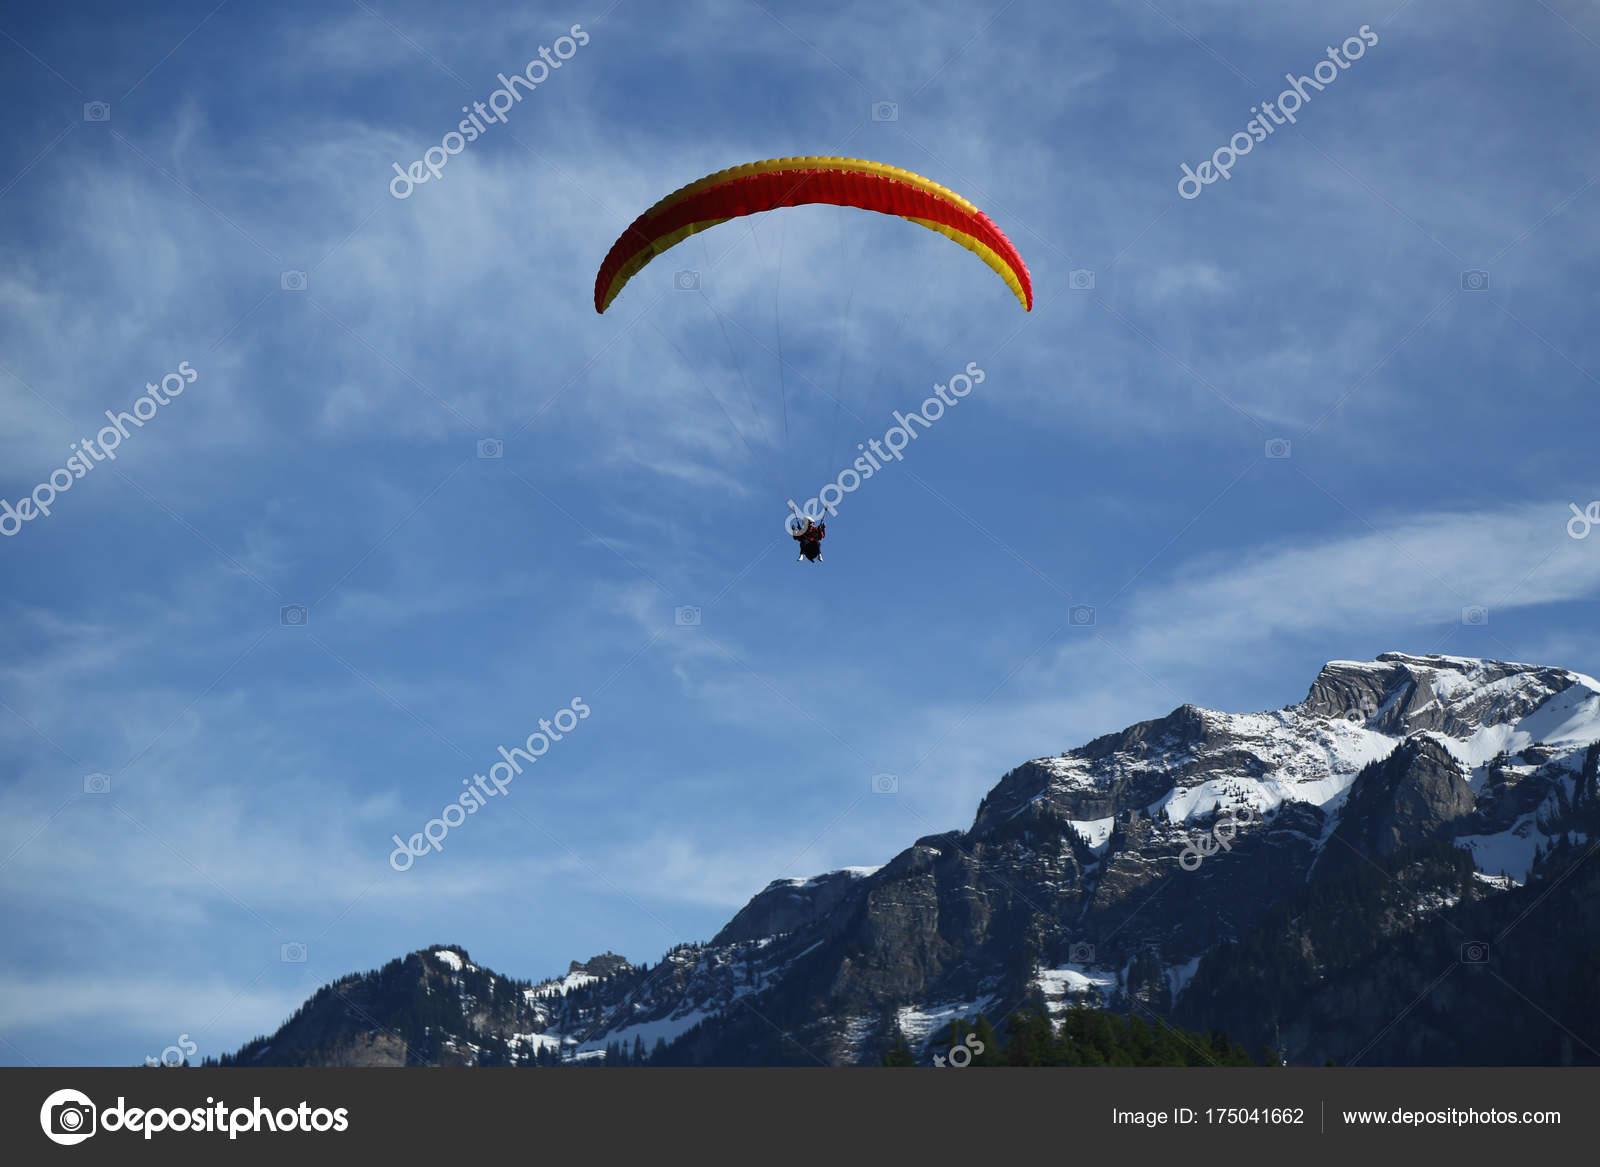 Interlaken switzerland may 2017 tandem paragliding flights swiss interlaken switzerland may 2017 tandem paragliding flights swiss alps interlaken stock photo publicscrutiny Gallery